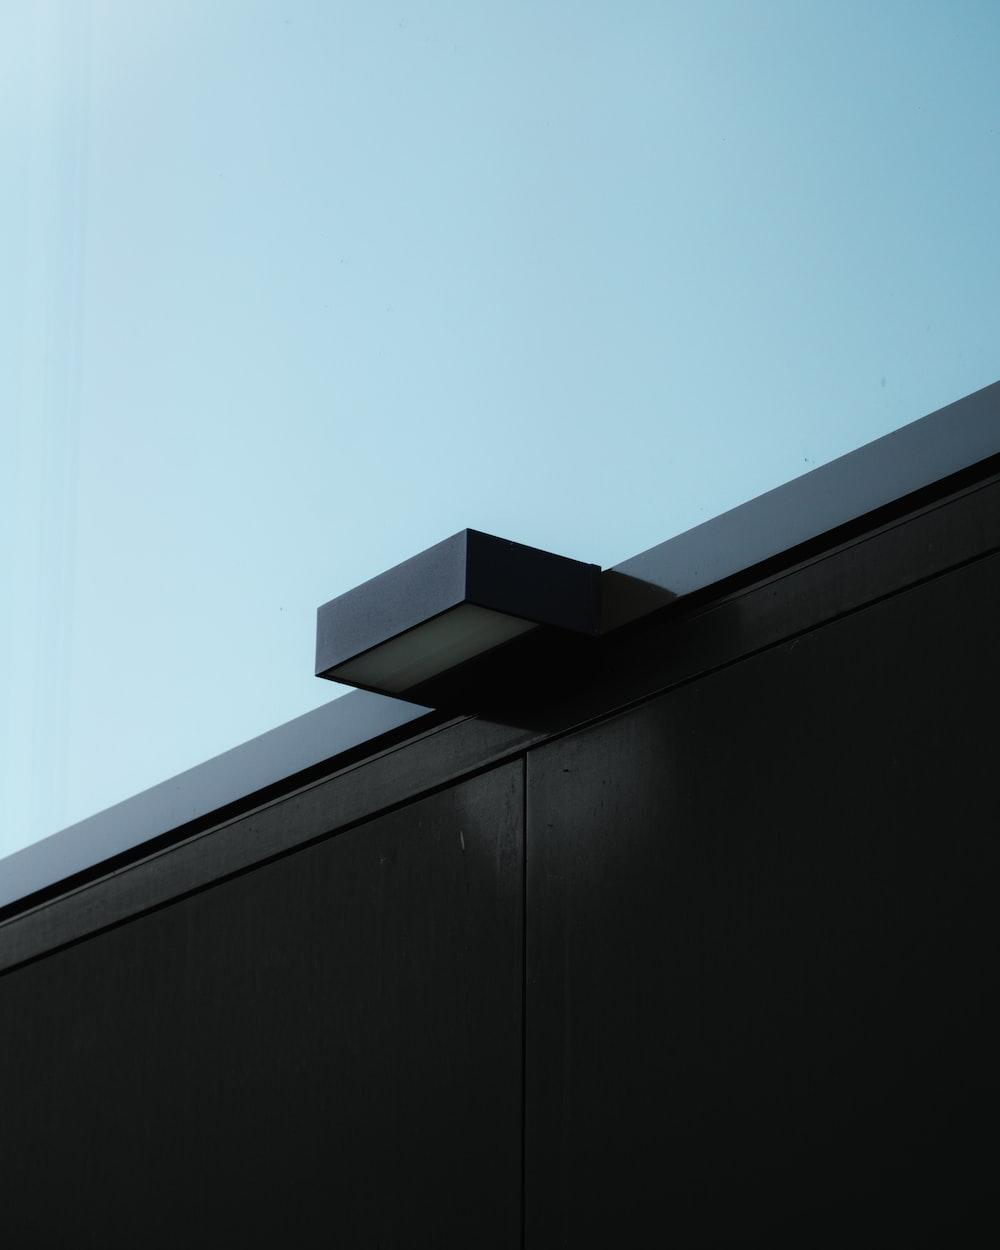 black wooden wall under blue sky